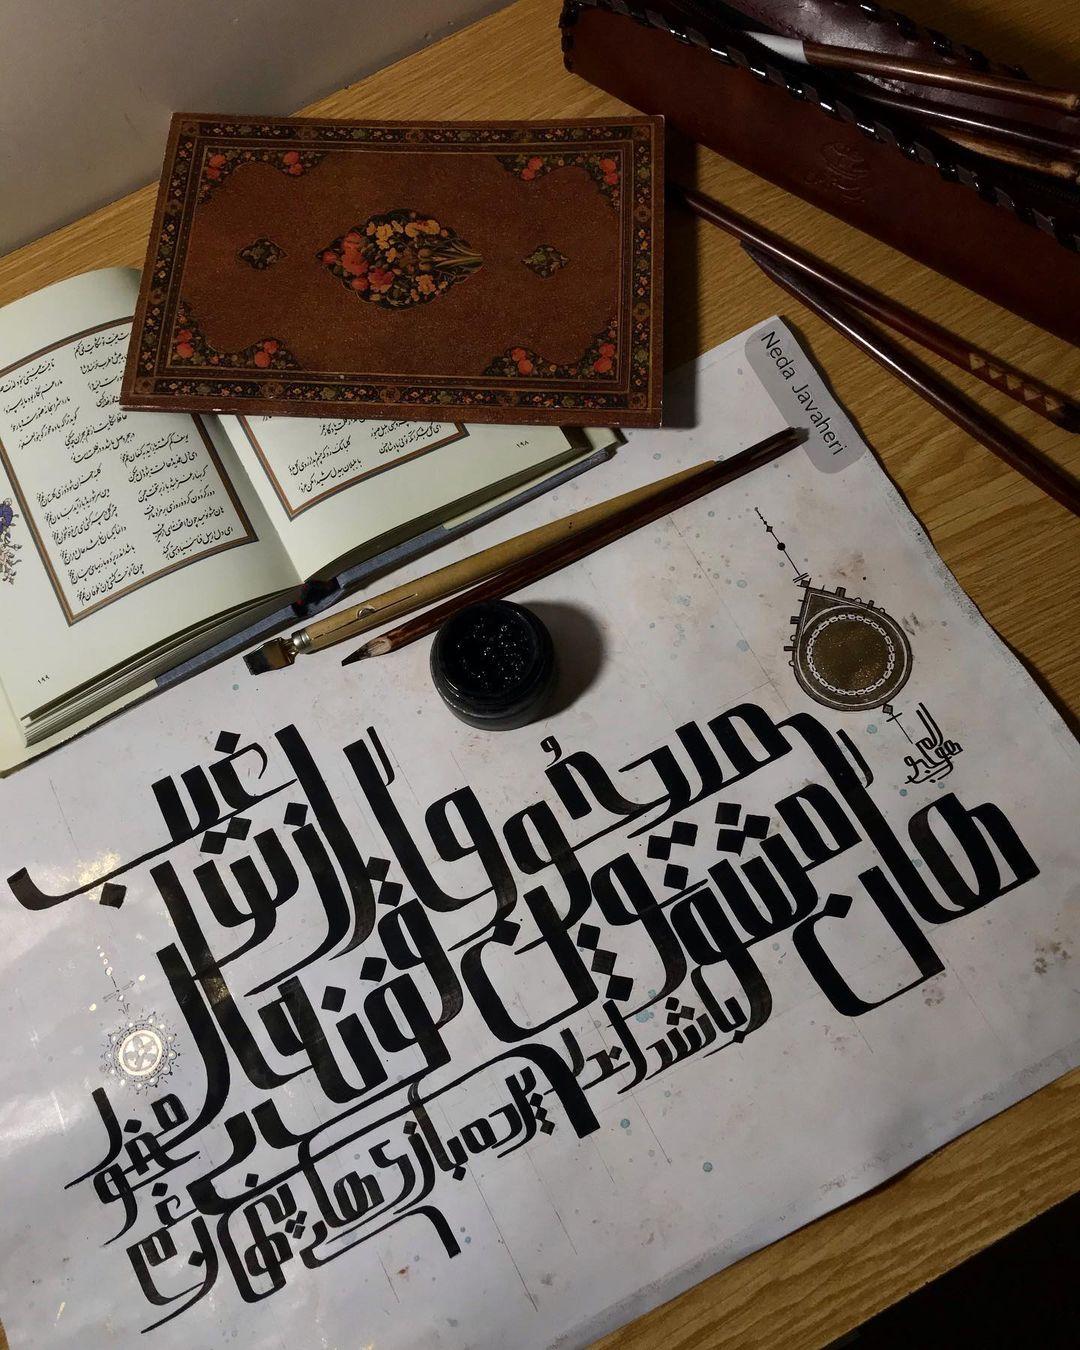 Karya Kaligrafi  جز وصلِ تو دل  به هر چه بستم، توبه…… ابوسعید ابوالخیر . . . مشق #فونت_نشاط …- Ne Javaher